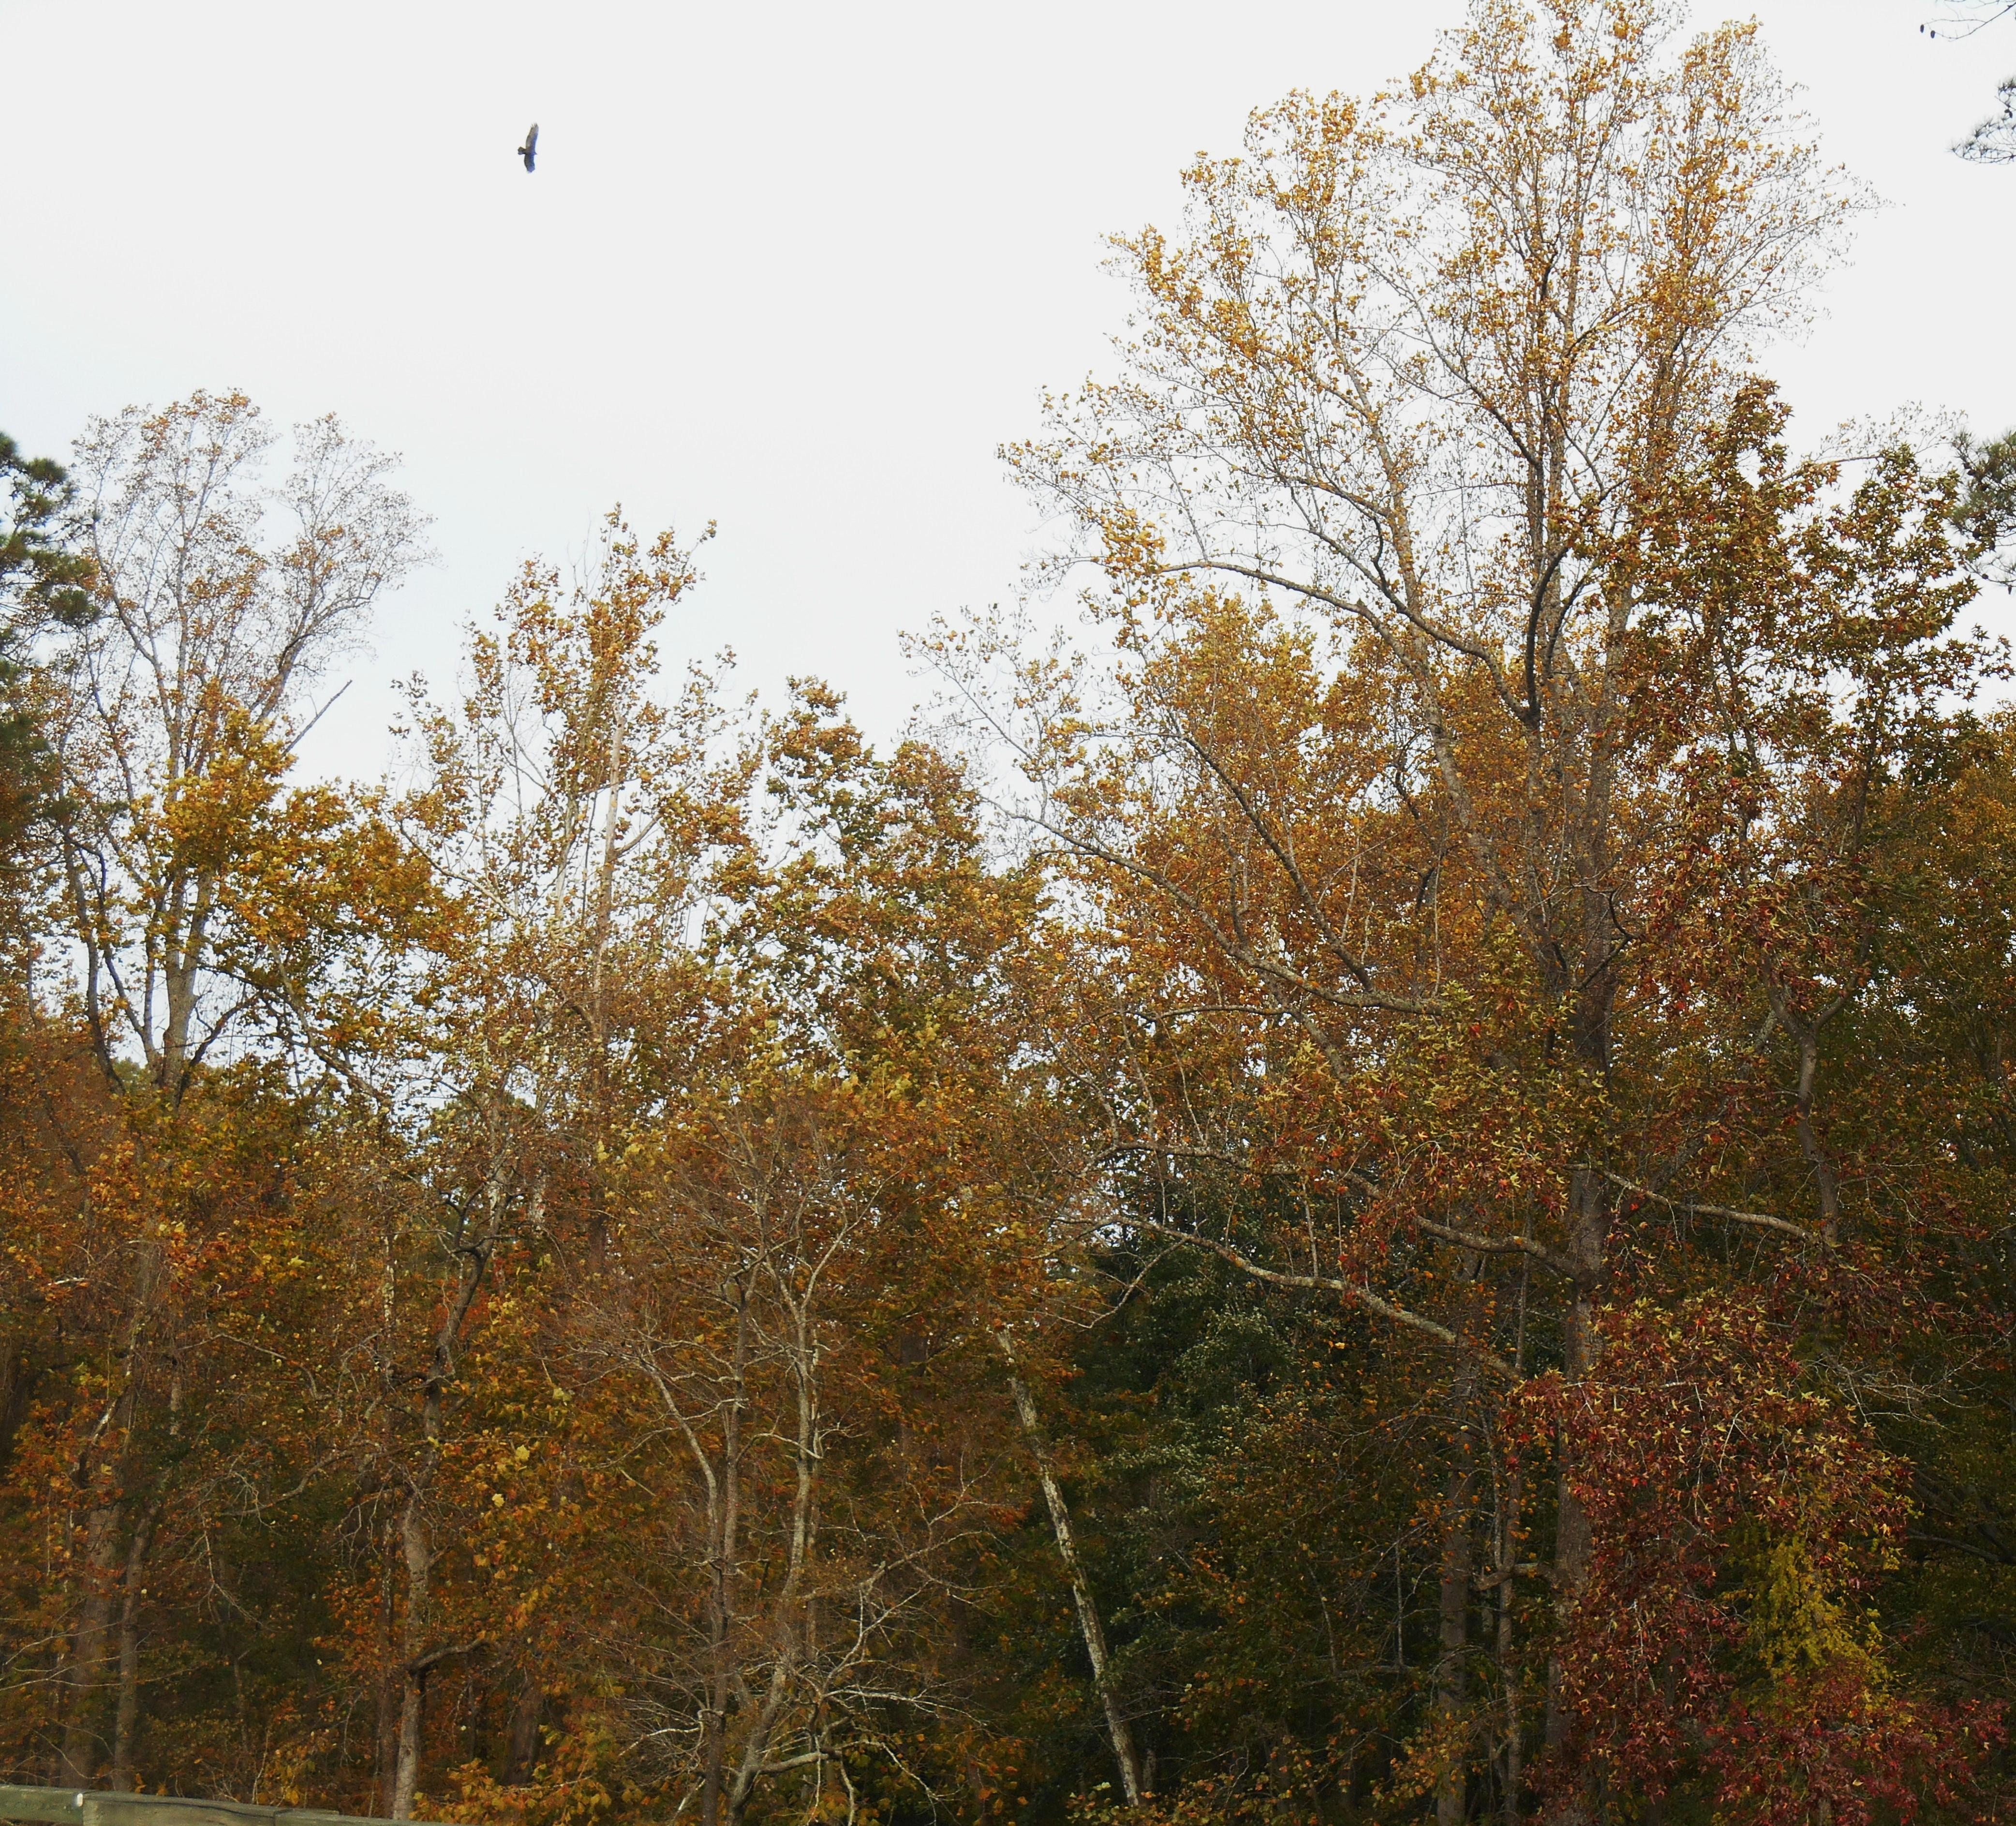 October 29, 2014 fall color 036